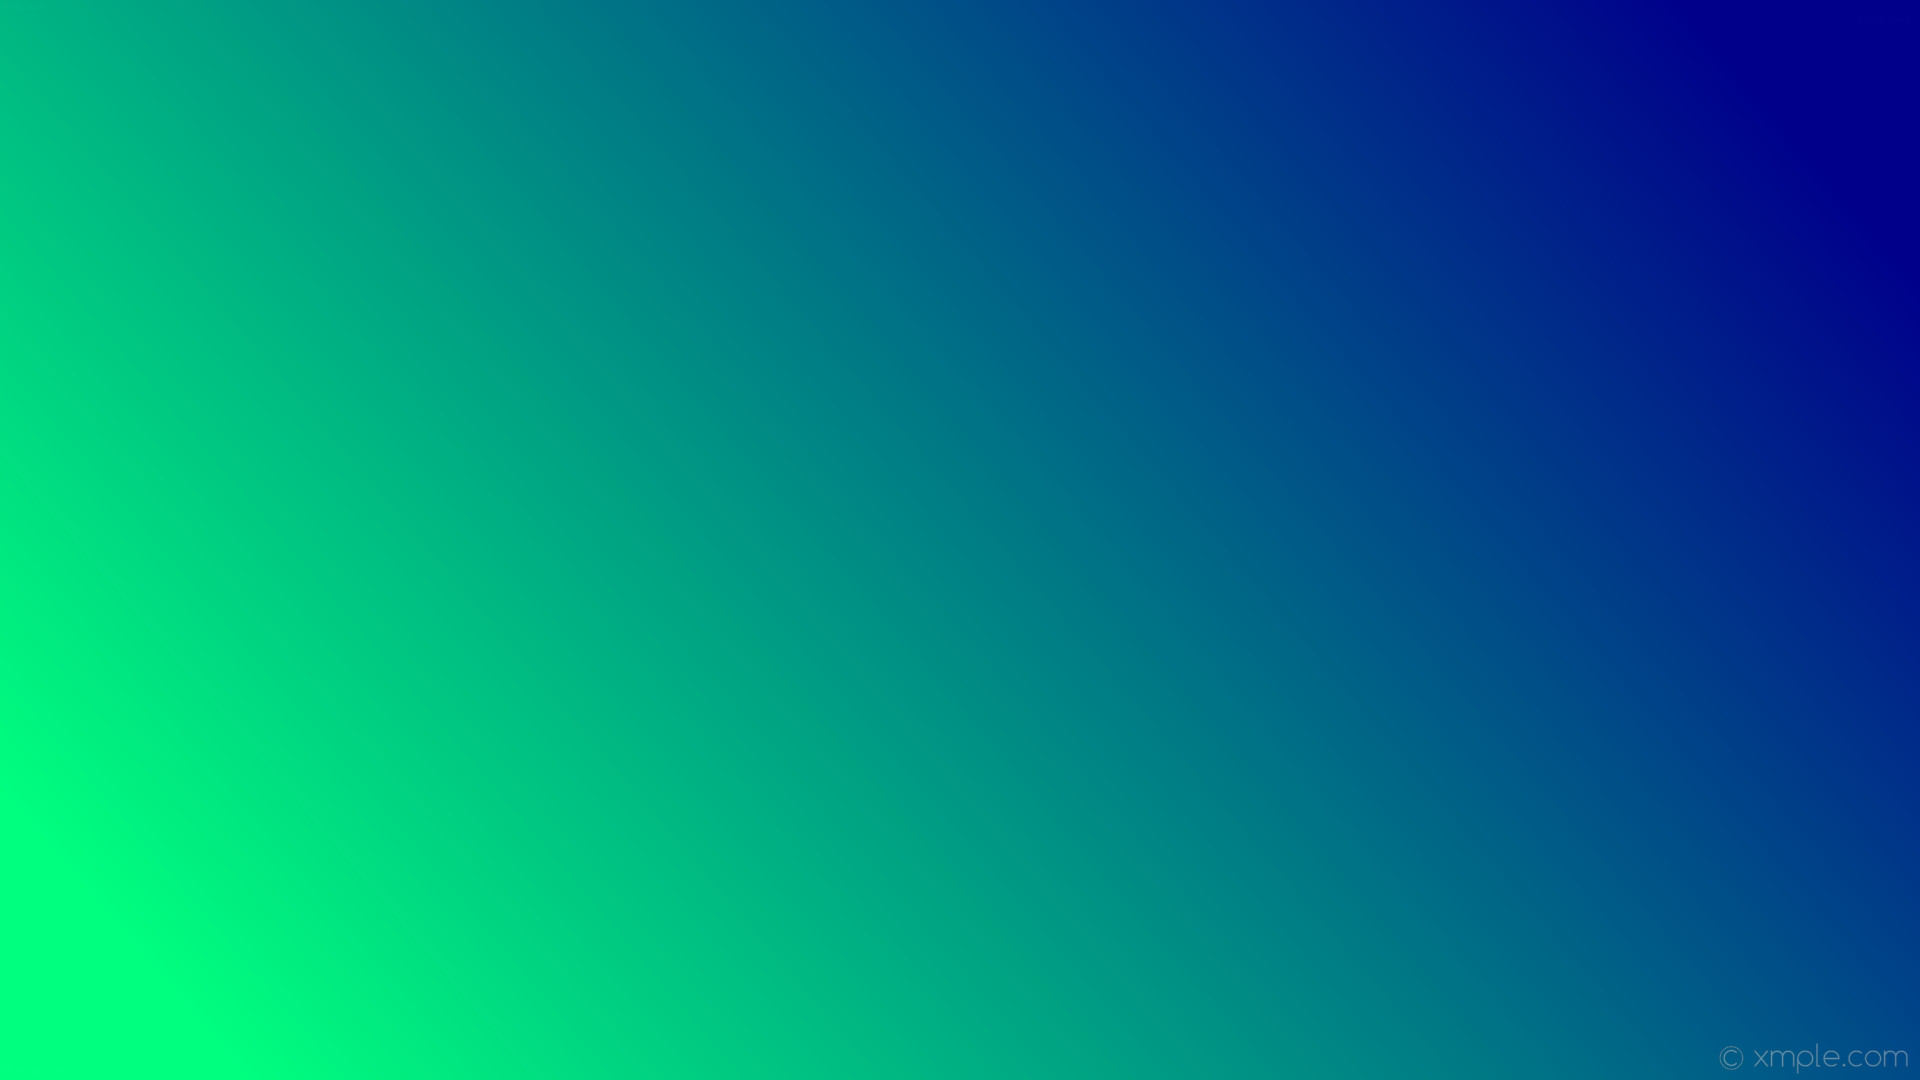 wallpaper linear gradient green blue spring green dark blue #00ff7f #00008b  195°